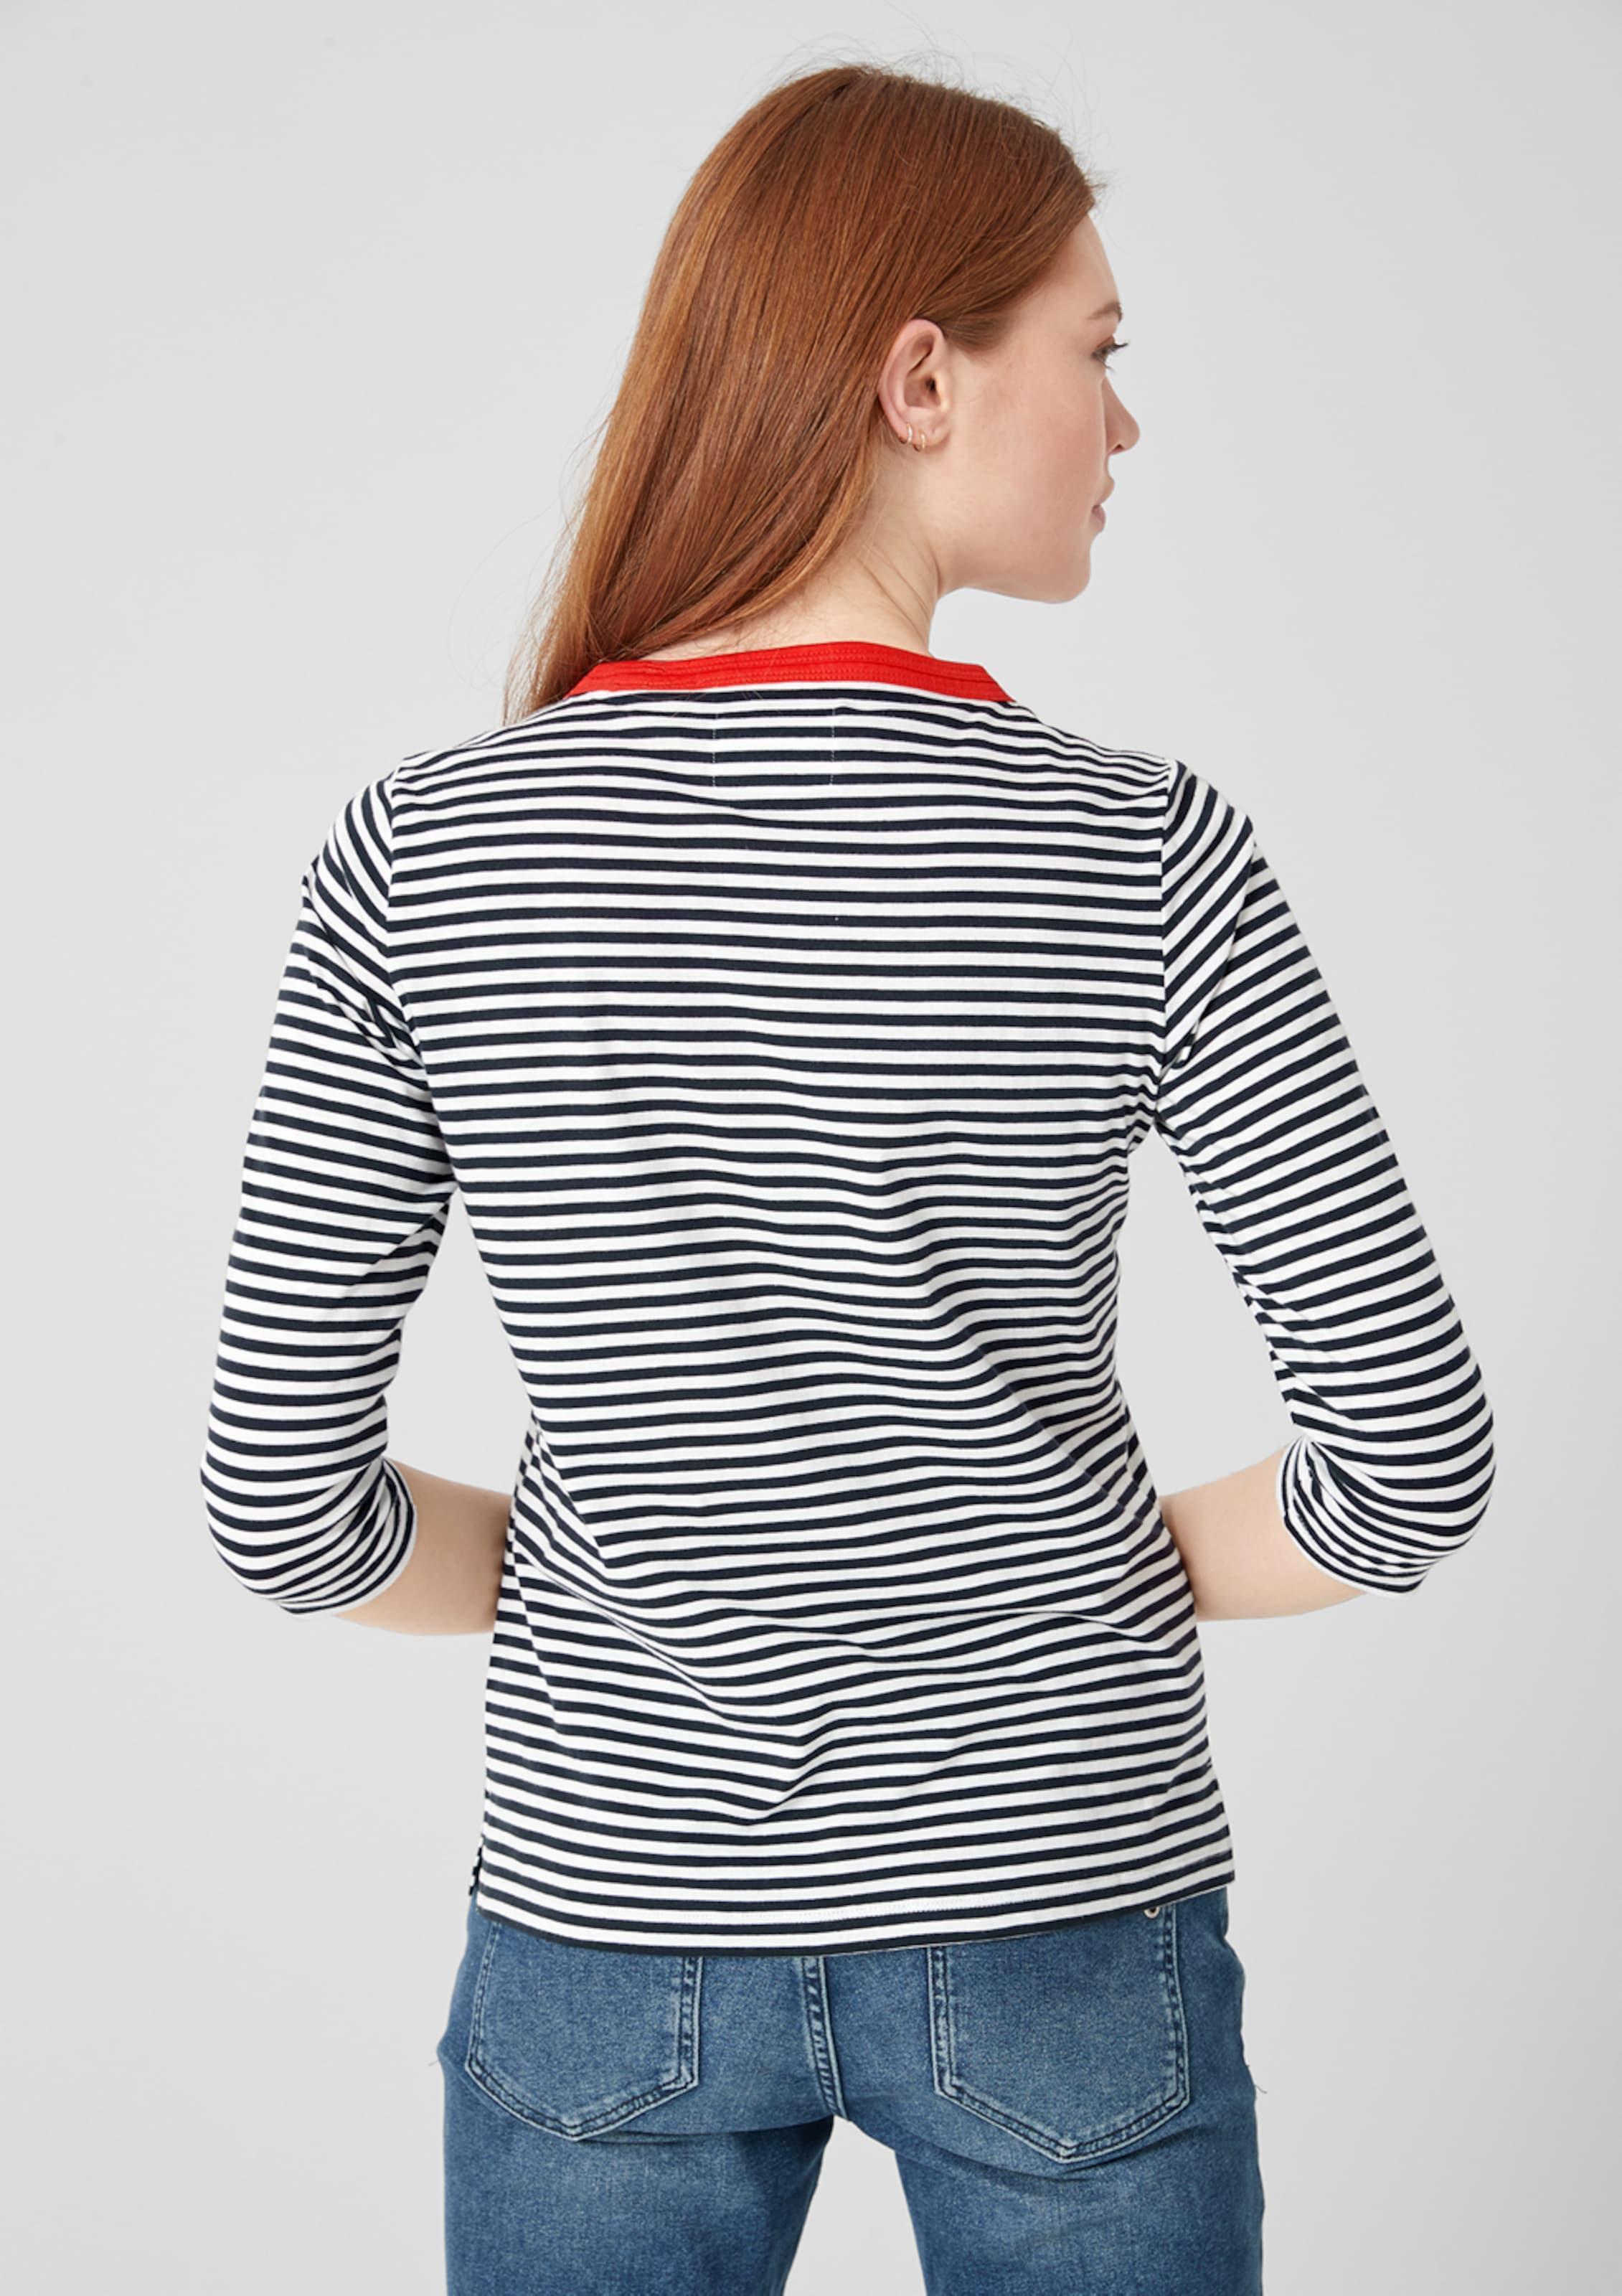 shirt Blanc 4 T Red Label arm' shirt 3 oliver 't S En BleuRouge Mit ulFKc5JT13